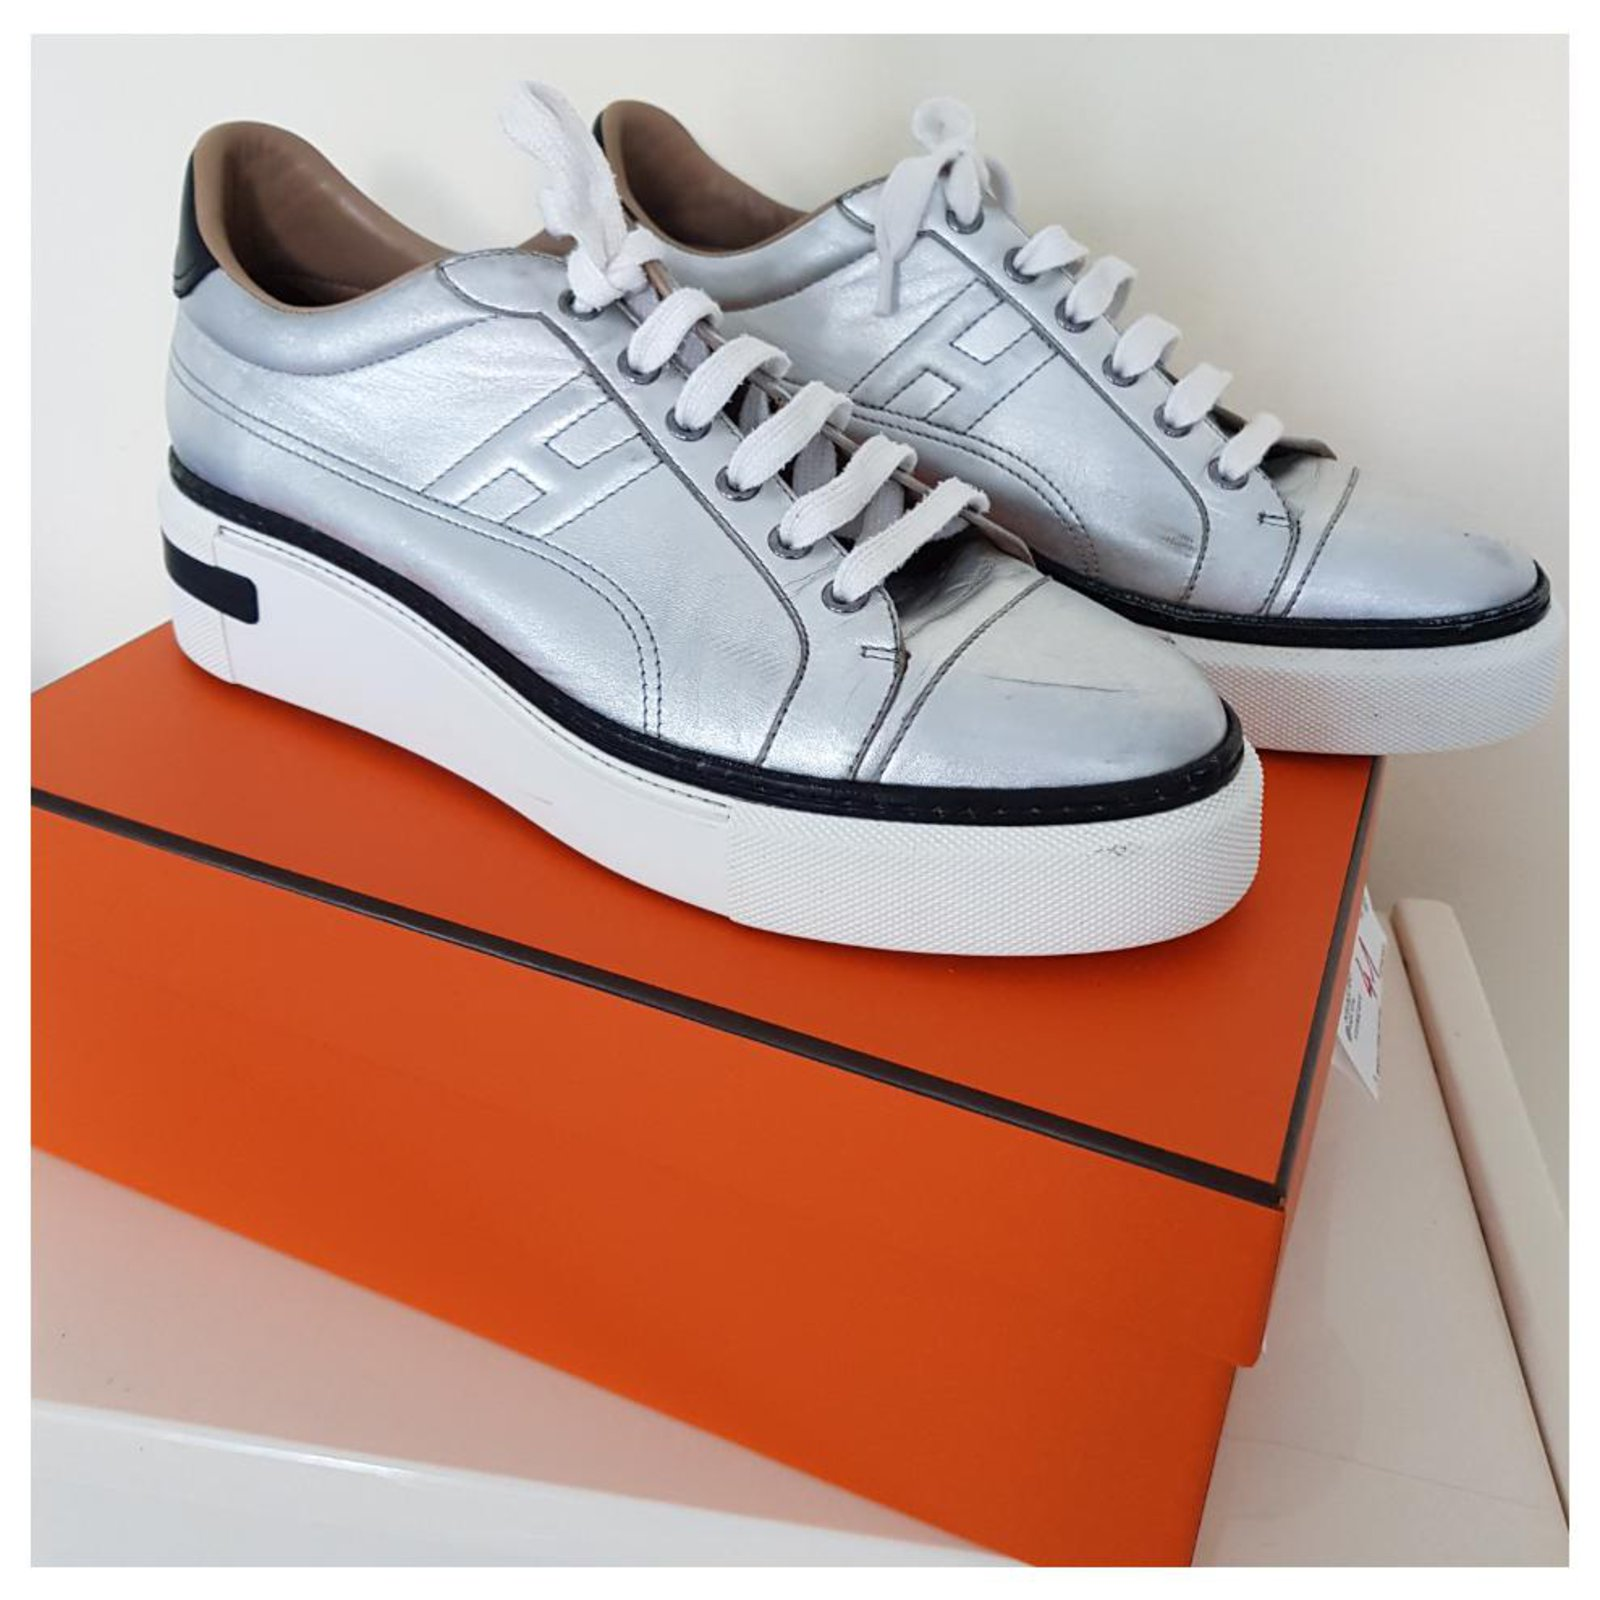 Hermès Polo Hermes silver Sneakers